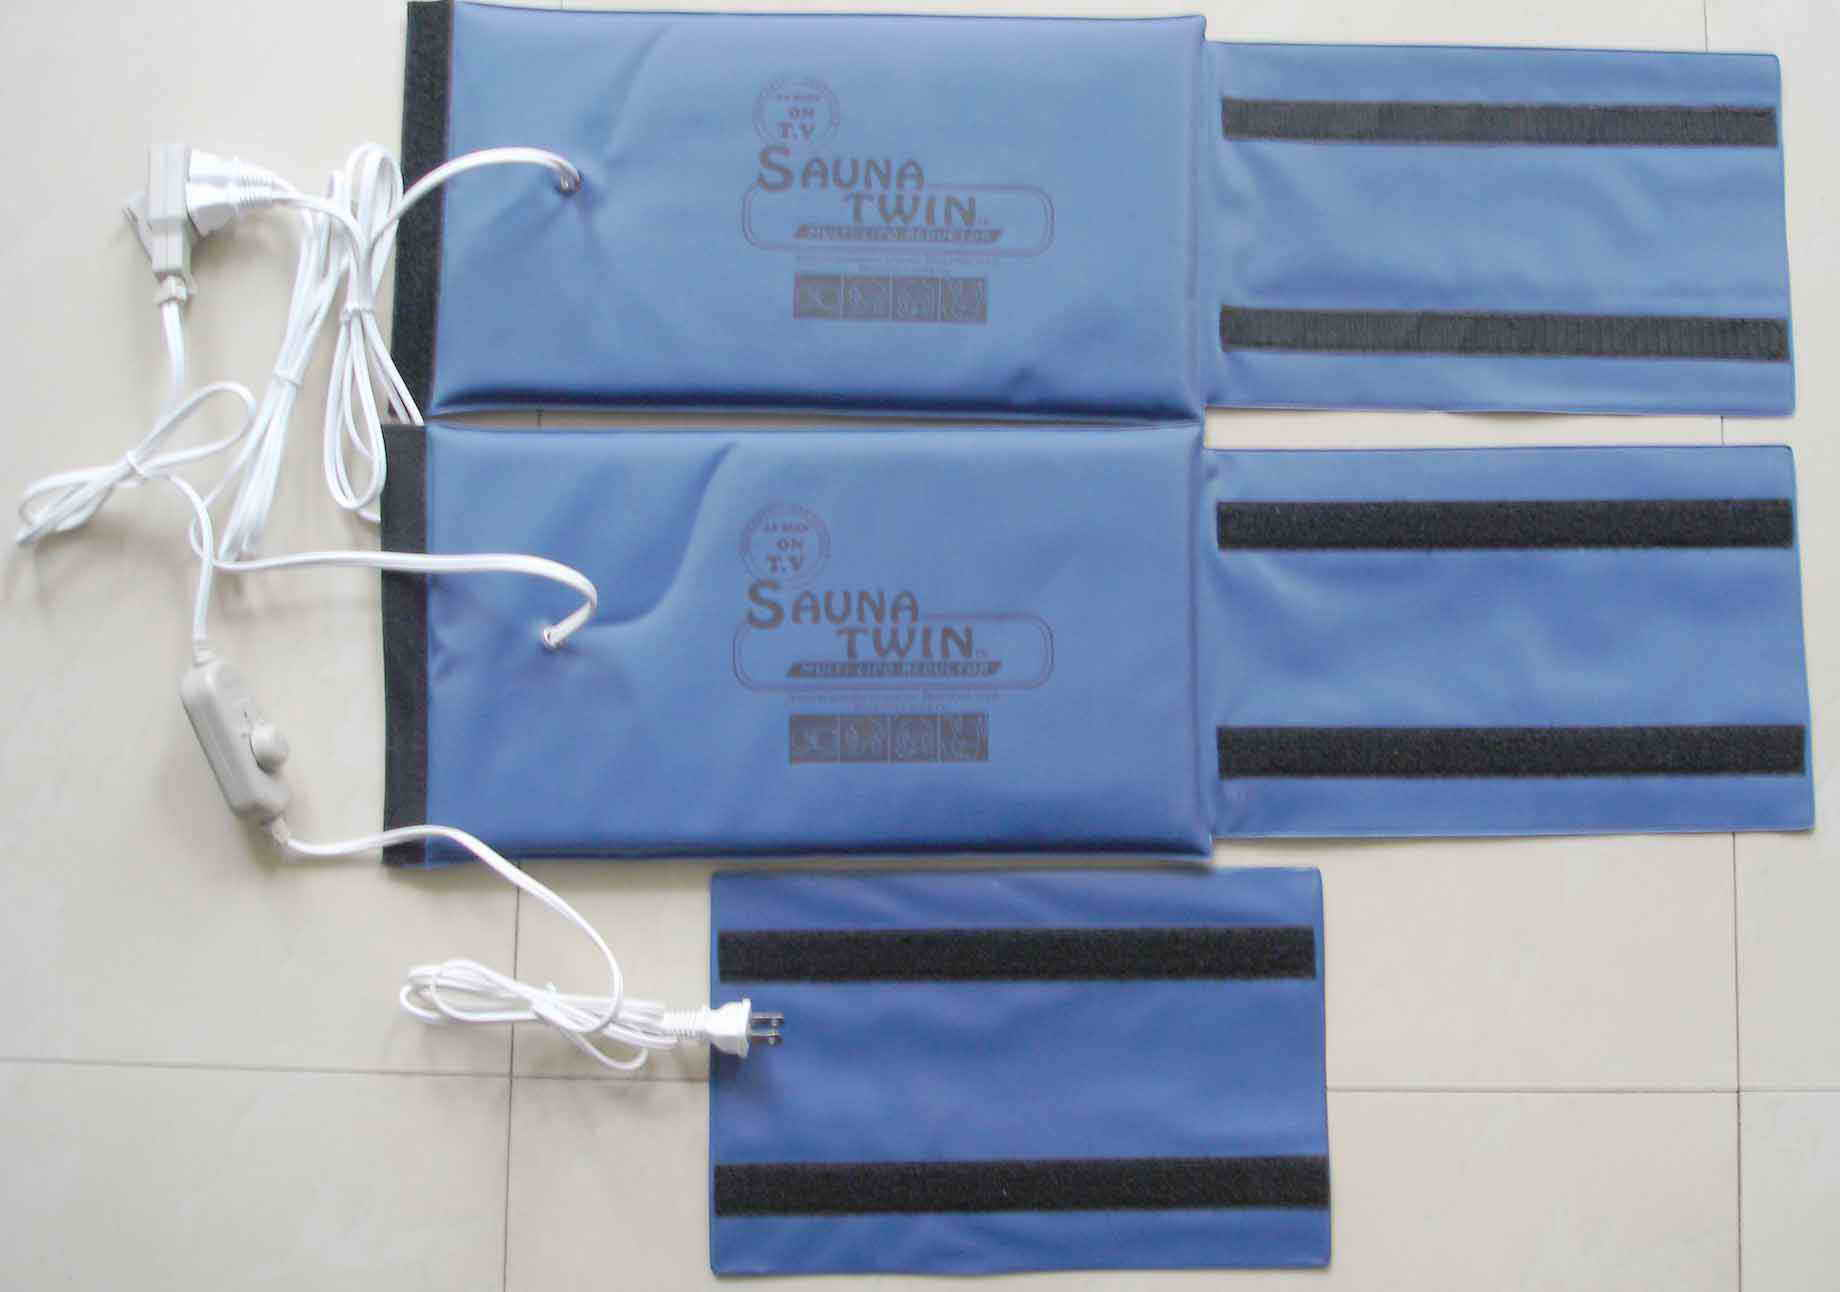 Sauna Twin Heating Pads For Slimming (Сауна Twin отопления площадок для похудения)